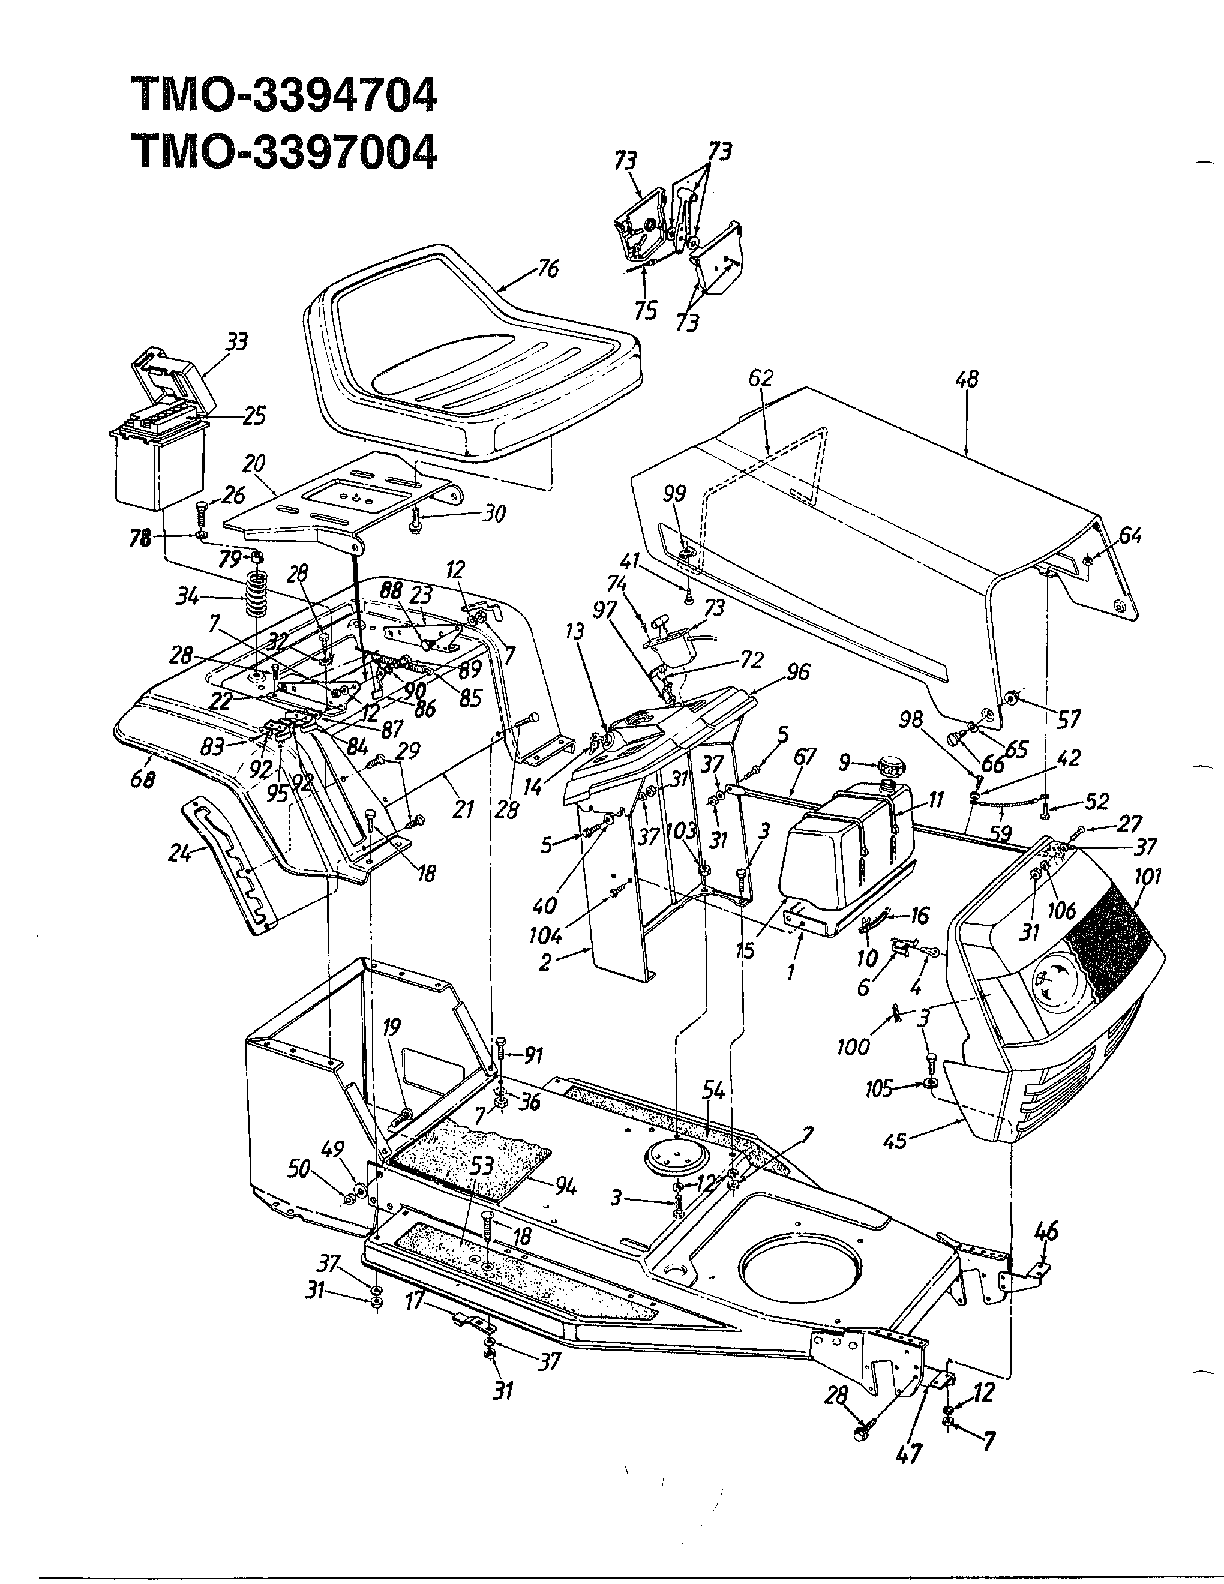 mtd tractor diagram wiring diagram used bolens mtd lawn tractor belt diagram mtd lawn tractor diagram [ 1224 x 1584 Pixel ]